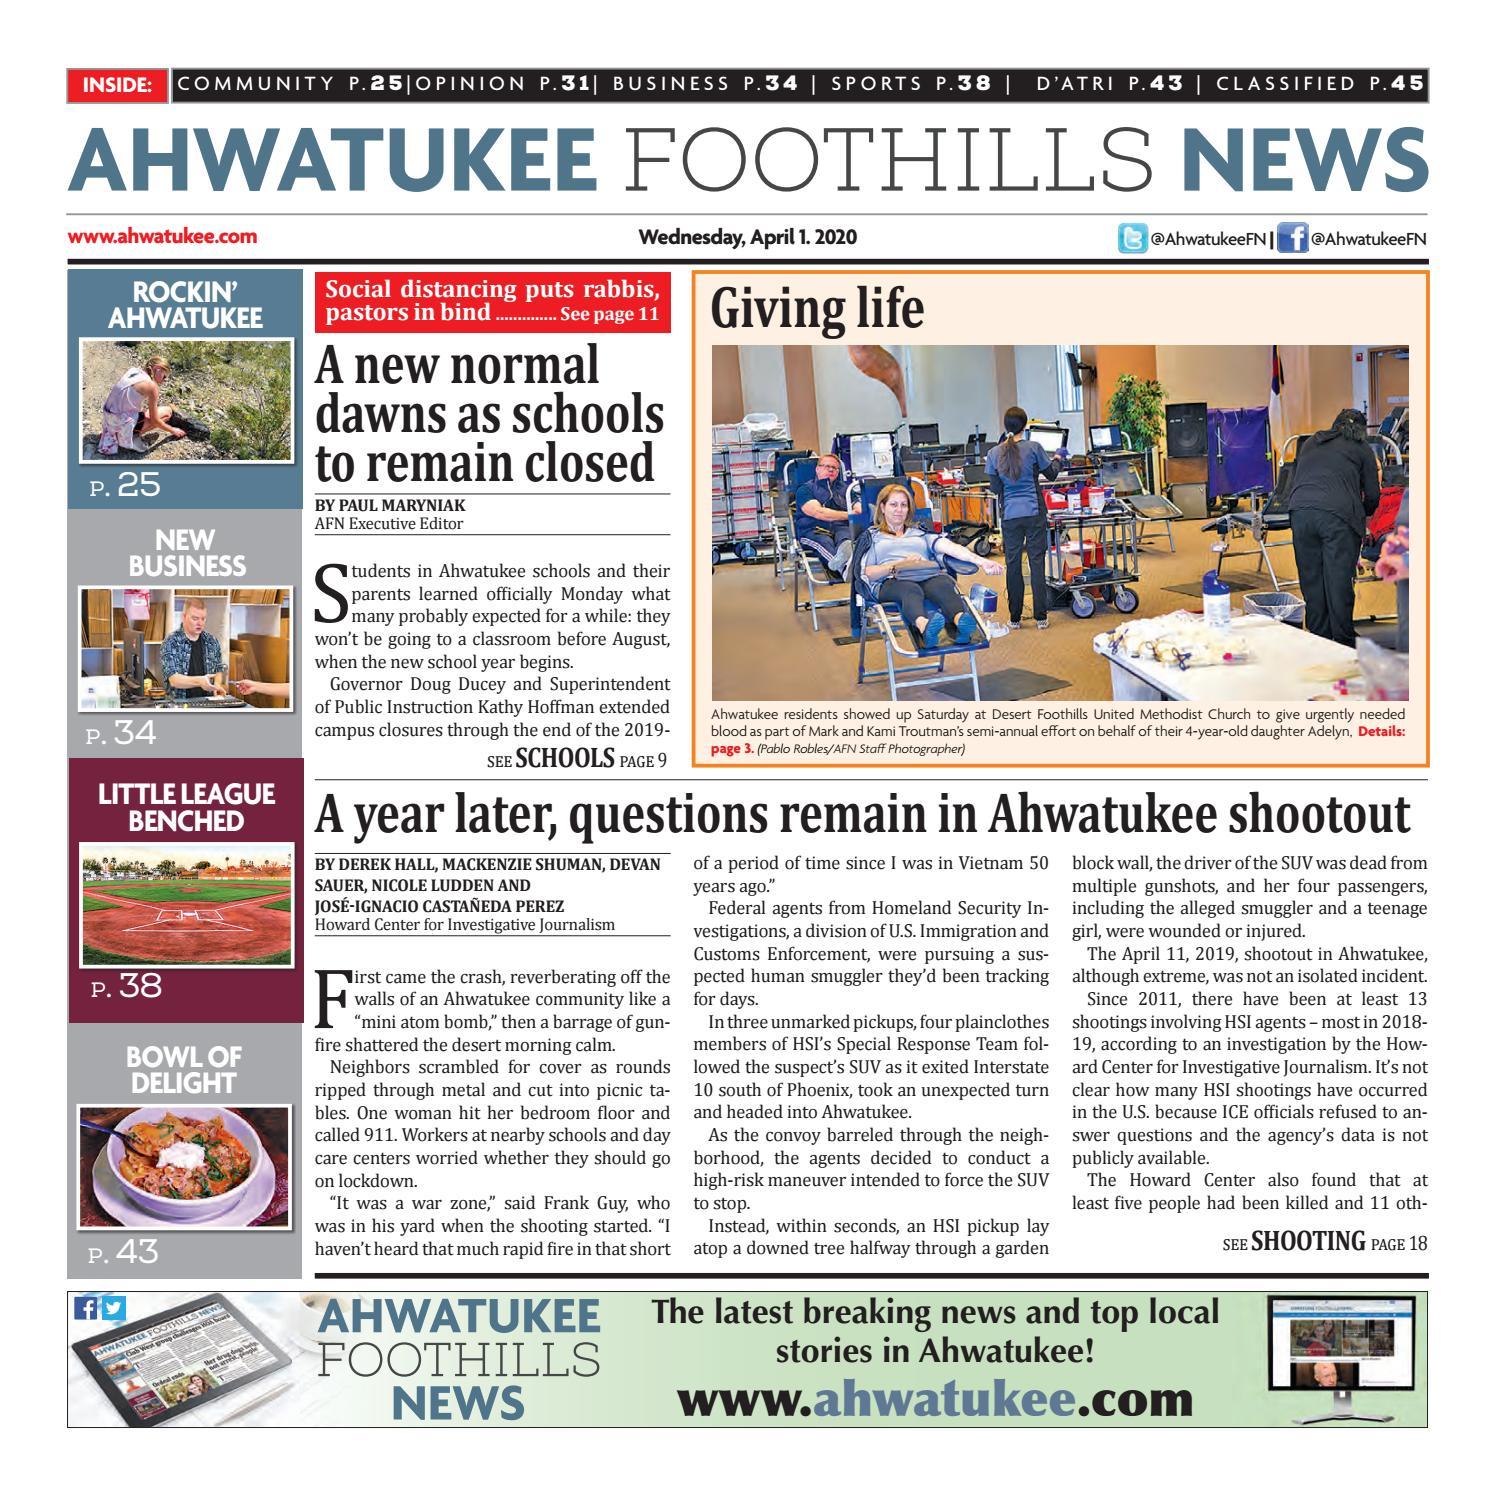 Ahwatukee Foothills News April 1